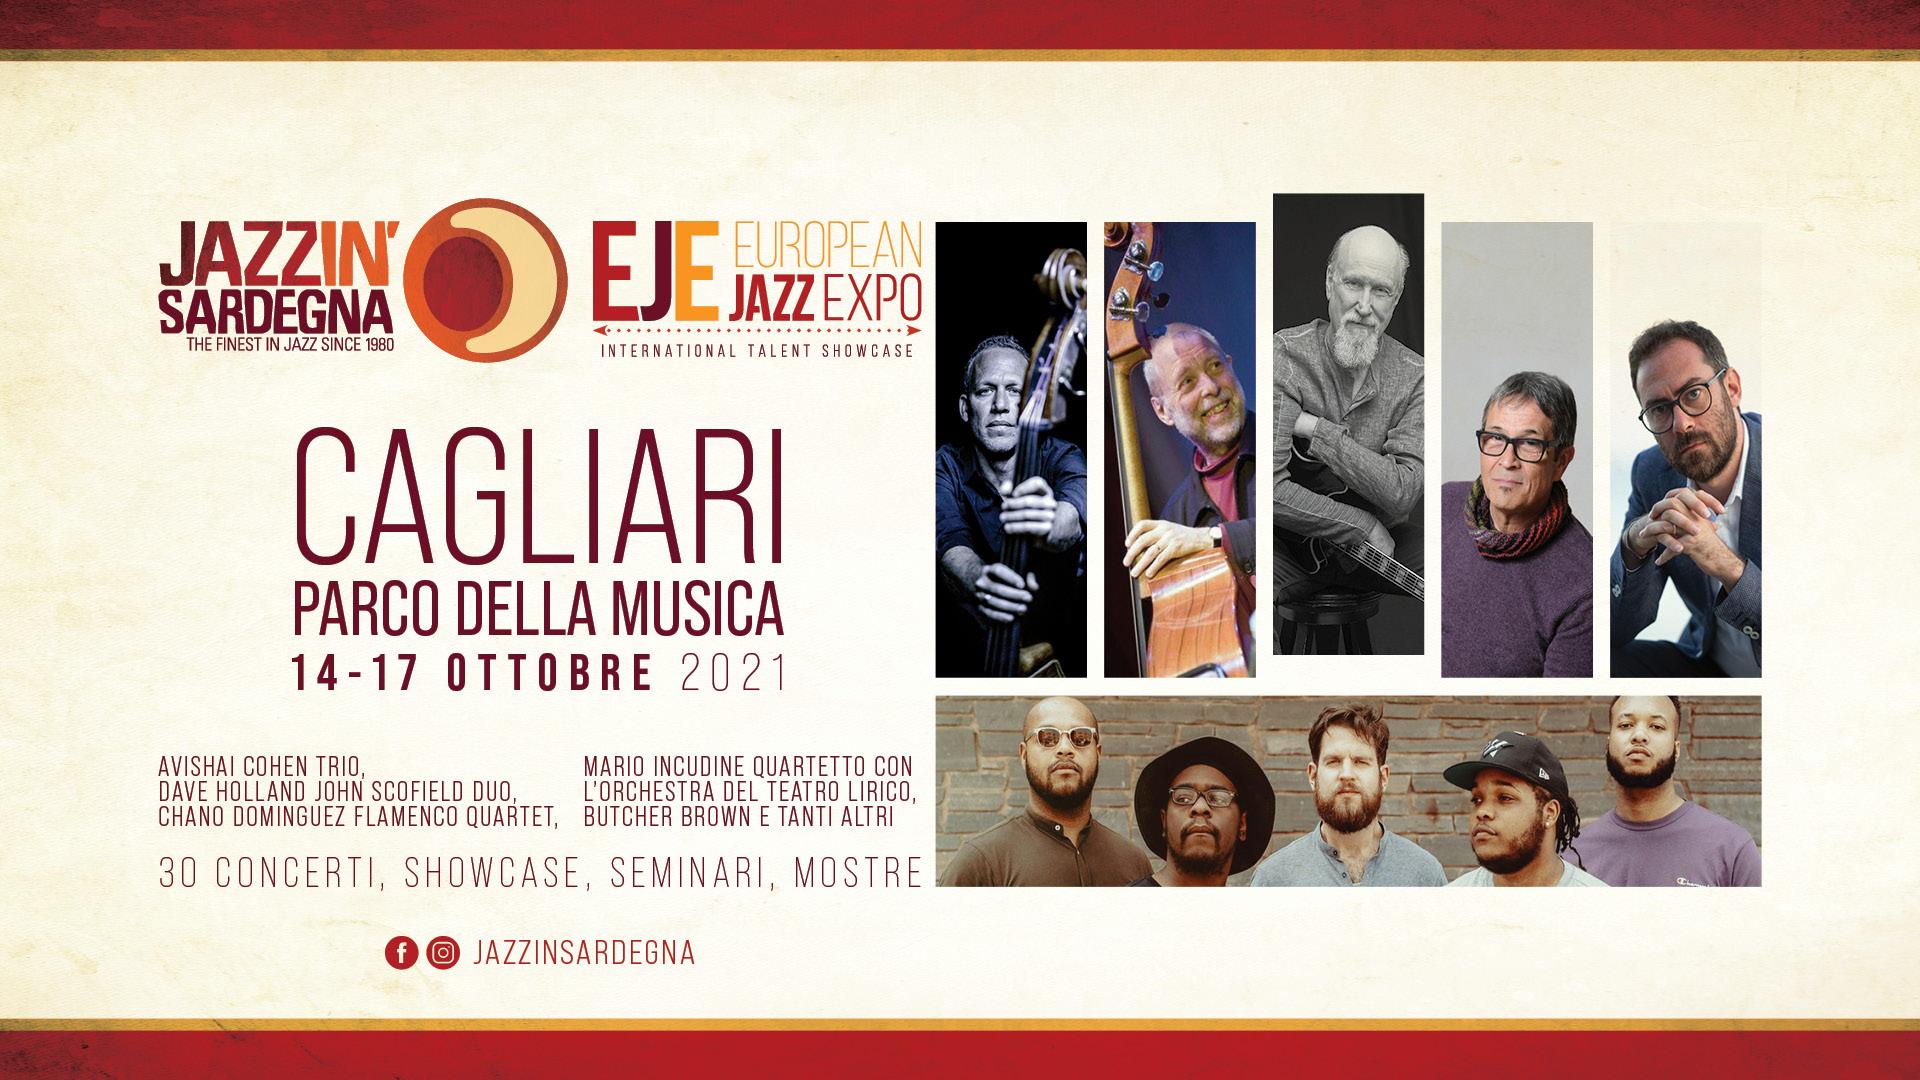 spagna-ospite-d-onore-la-grande-vetrina-spagnola-al-41-festival-internazionale-jazz-in-sardegna-european-jazz-expo